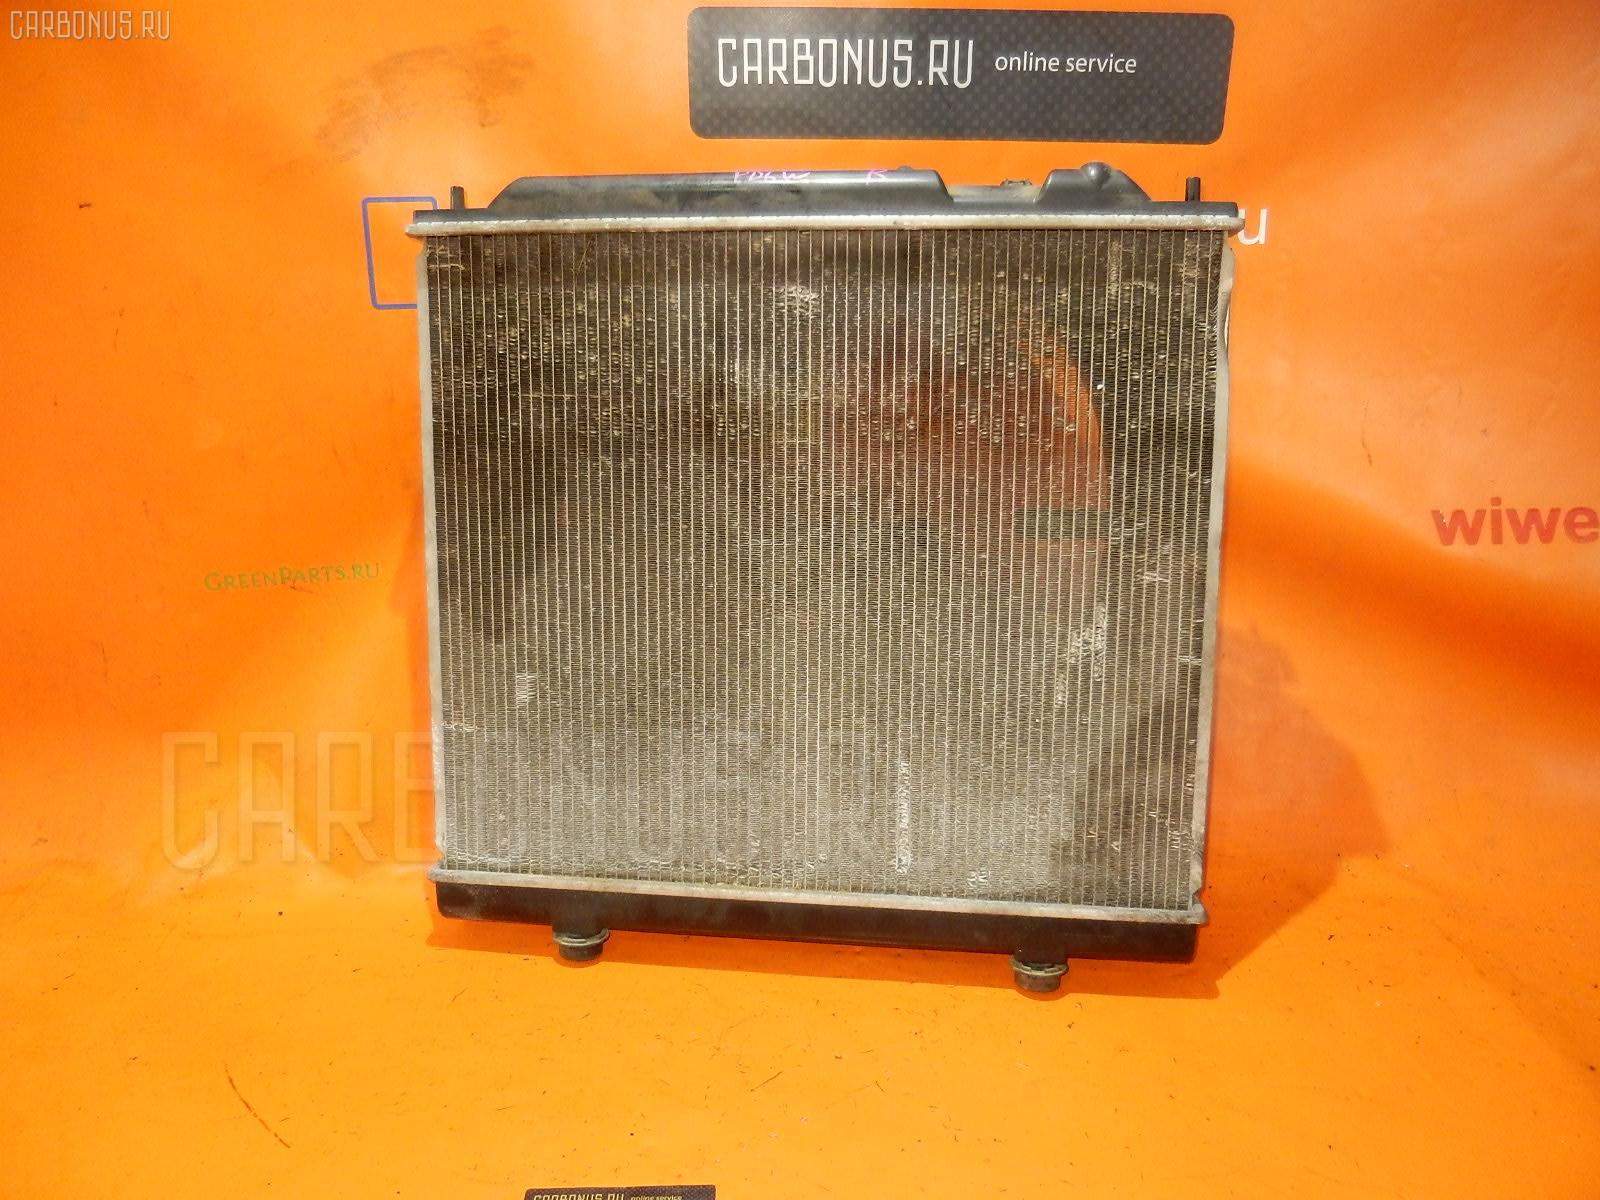 Радиатор ДВС MITSUBISHI DELICA SPACEGEAR PD6W 6G72 Фото 2